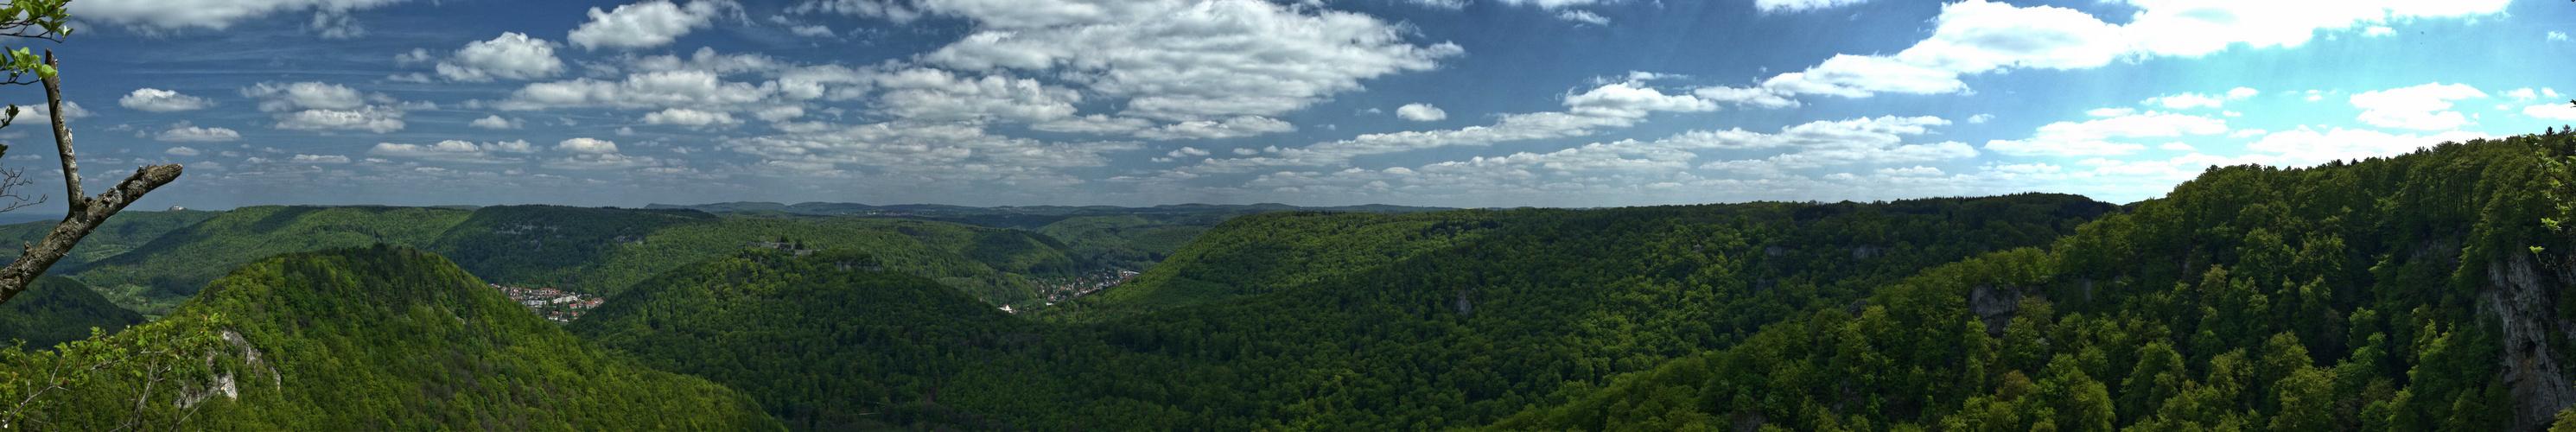 Ruschenfelsen - Panorama I